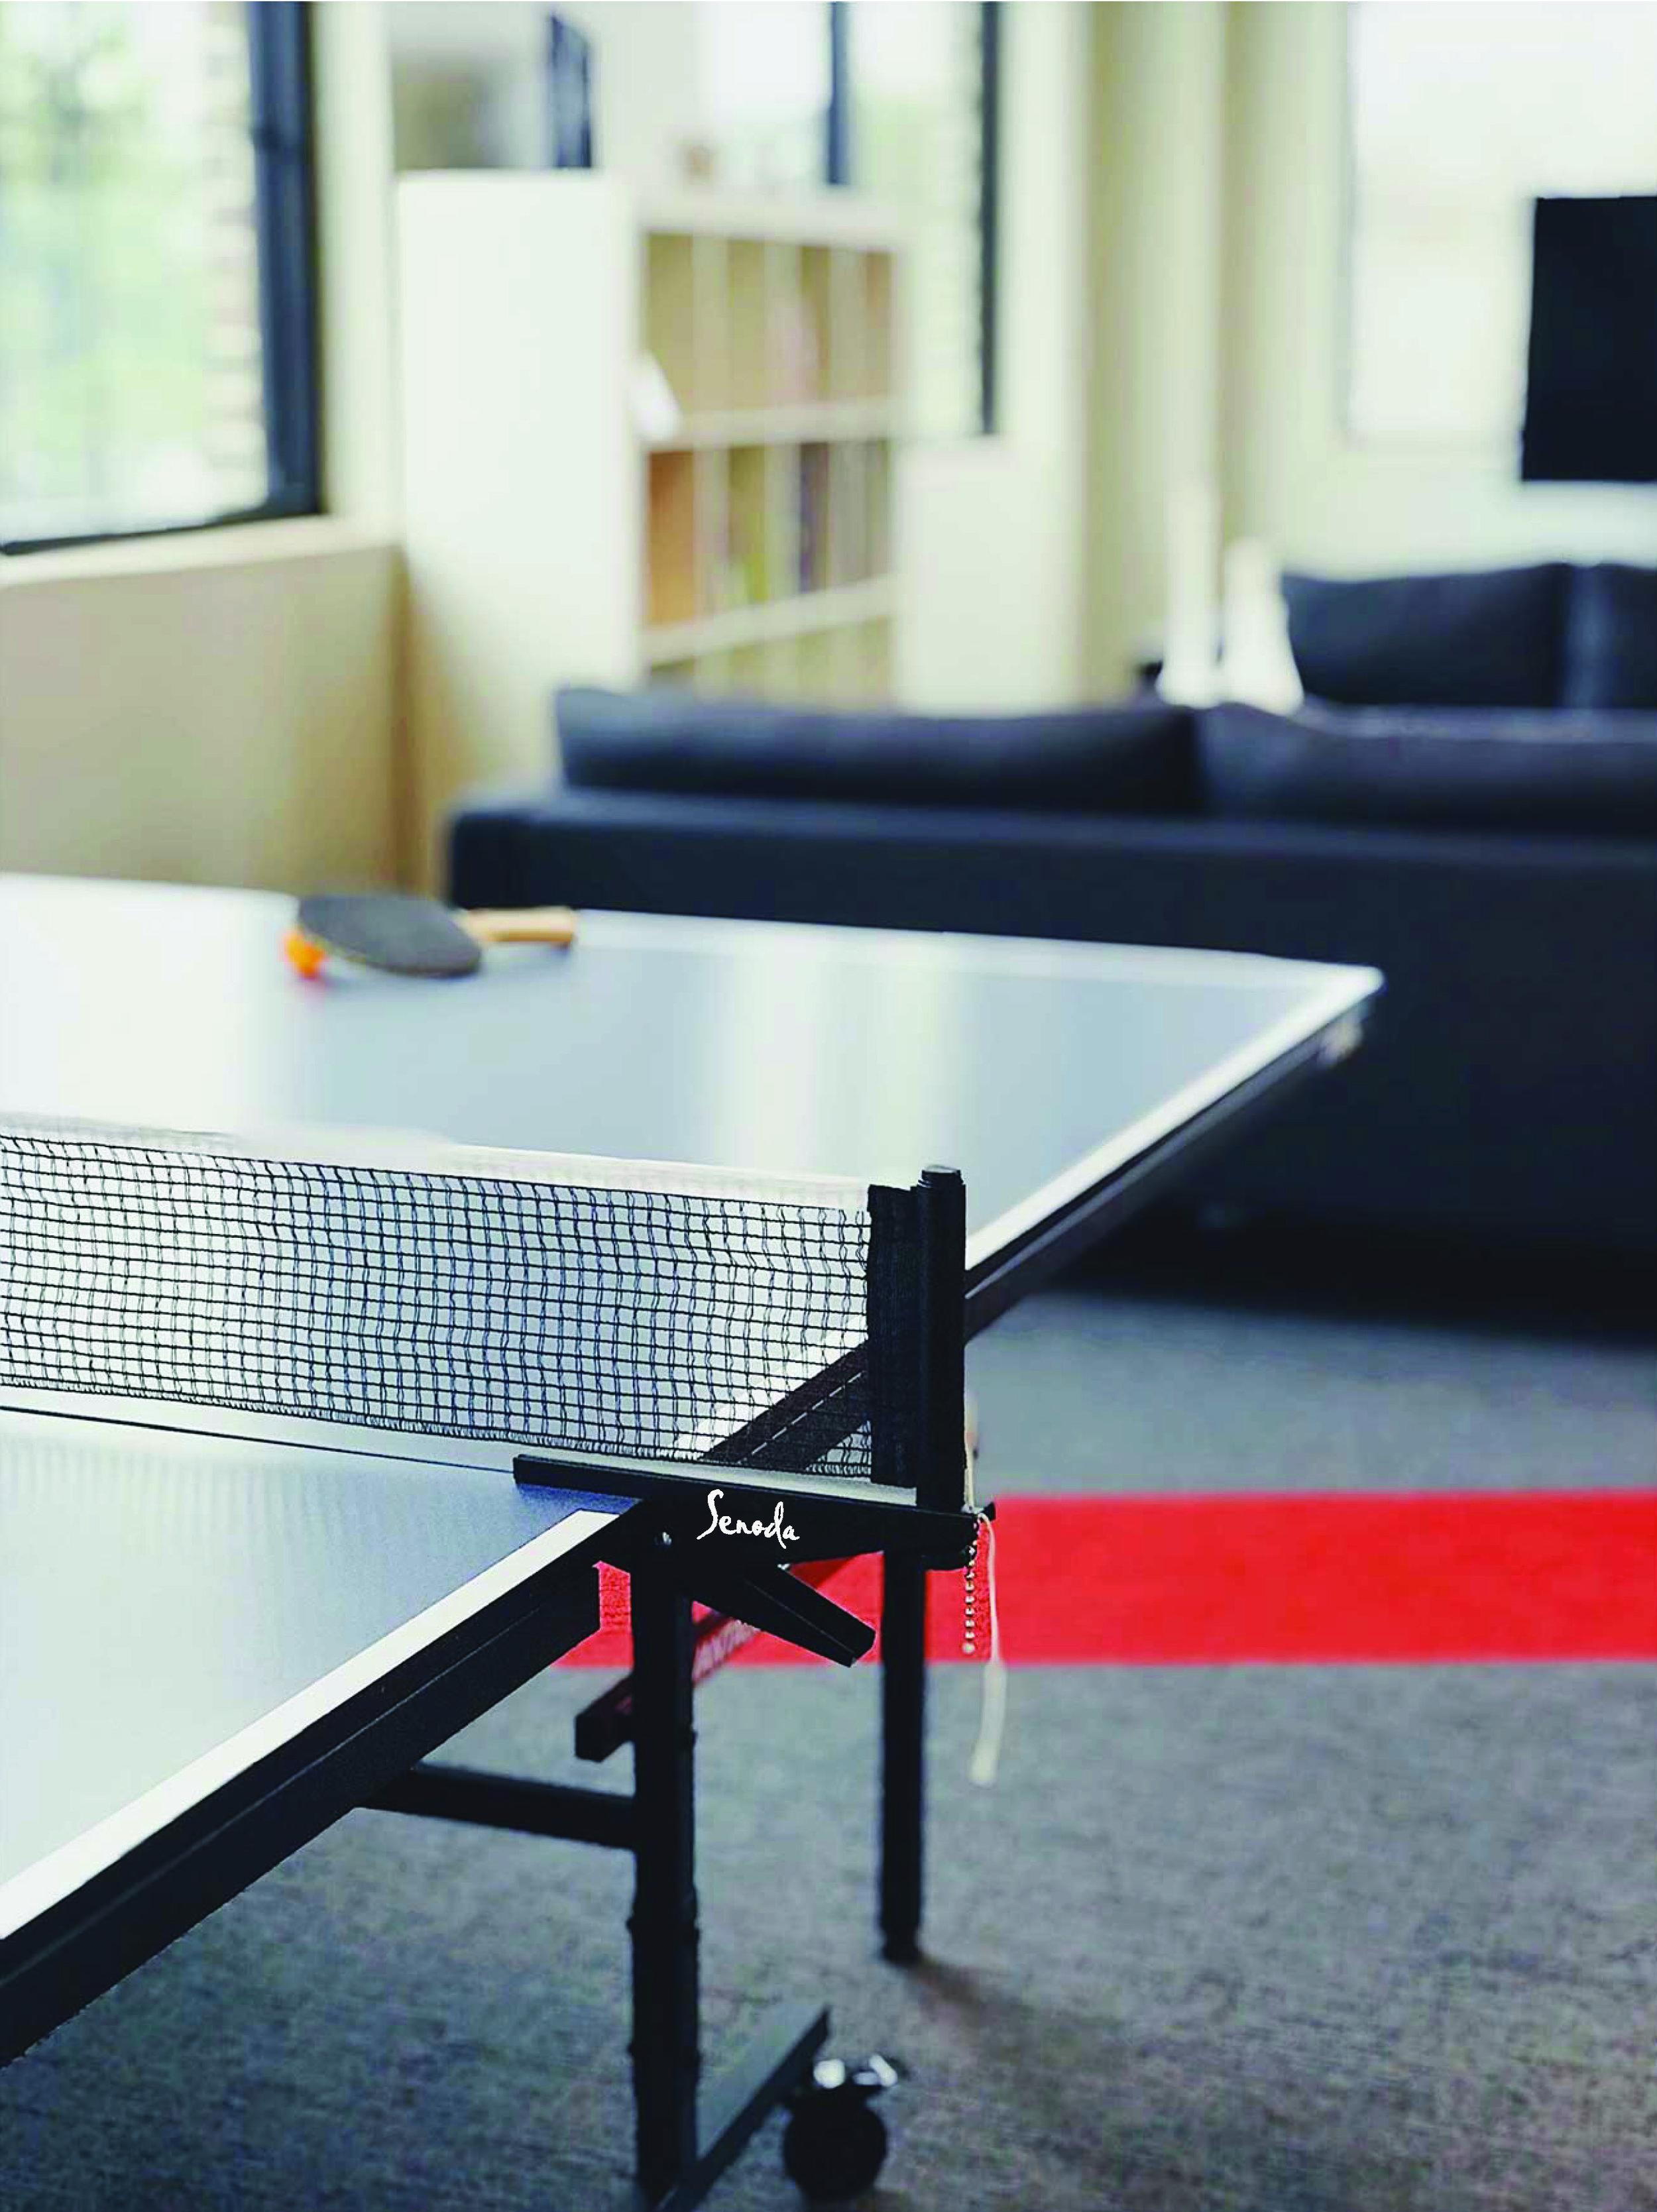 about-ping-pong-table_senoda.jpg